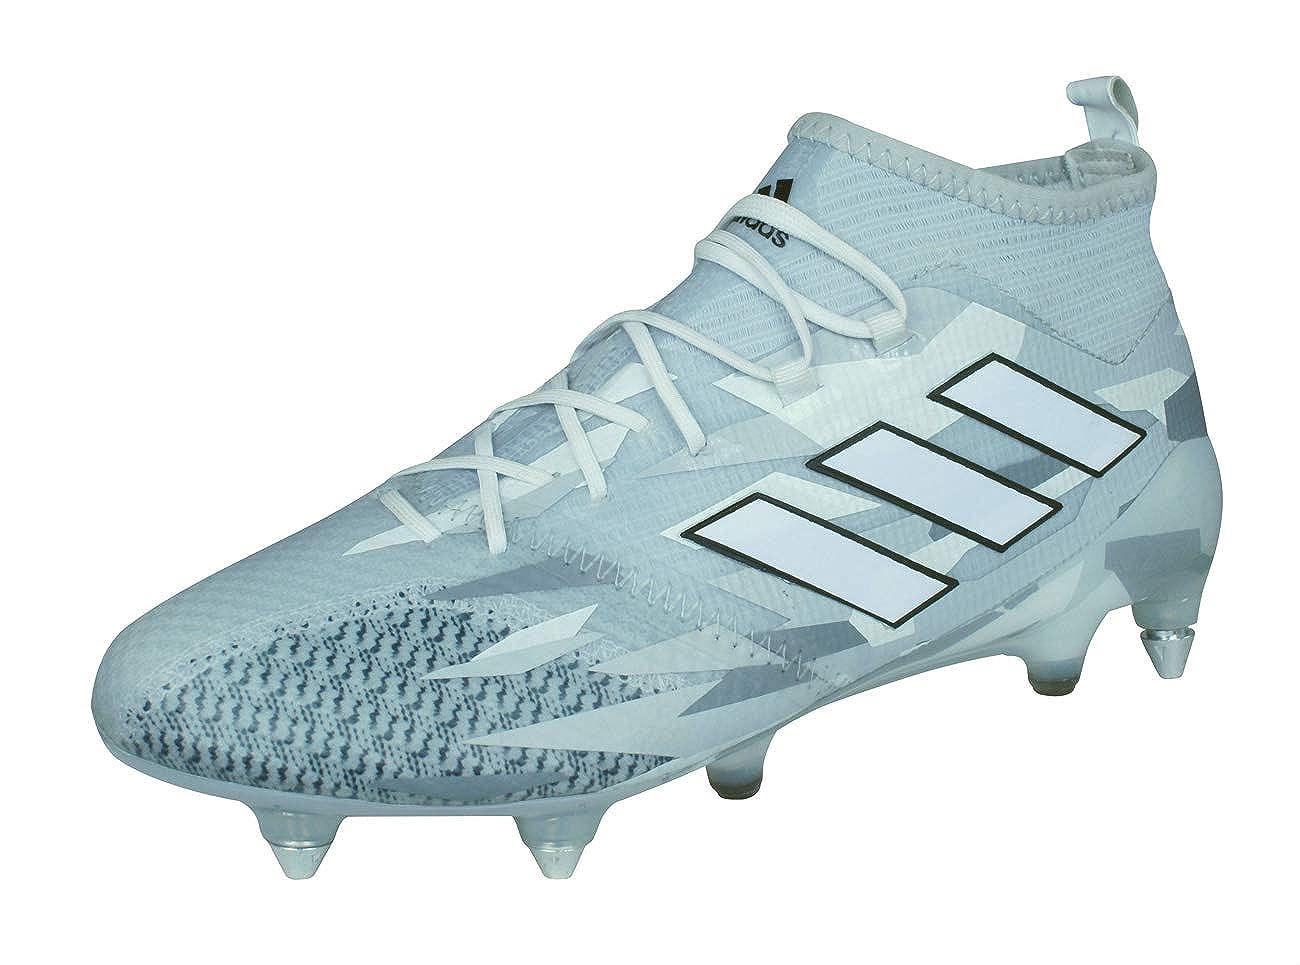 Ace 17.1 Primeknit SG Football Stiefel - Clear Grau Weiß Core schwarz - Größe 7